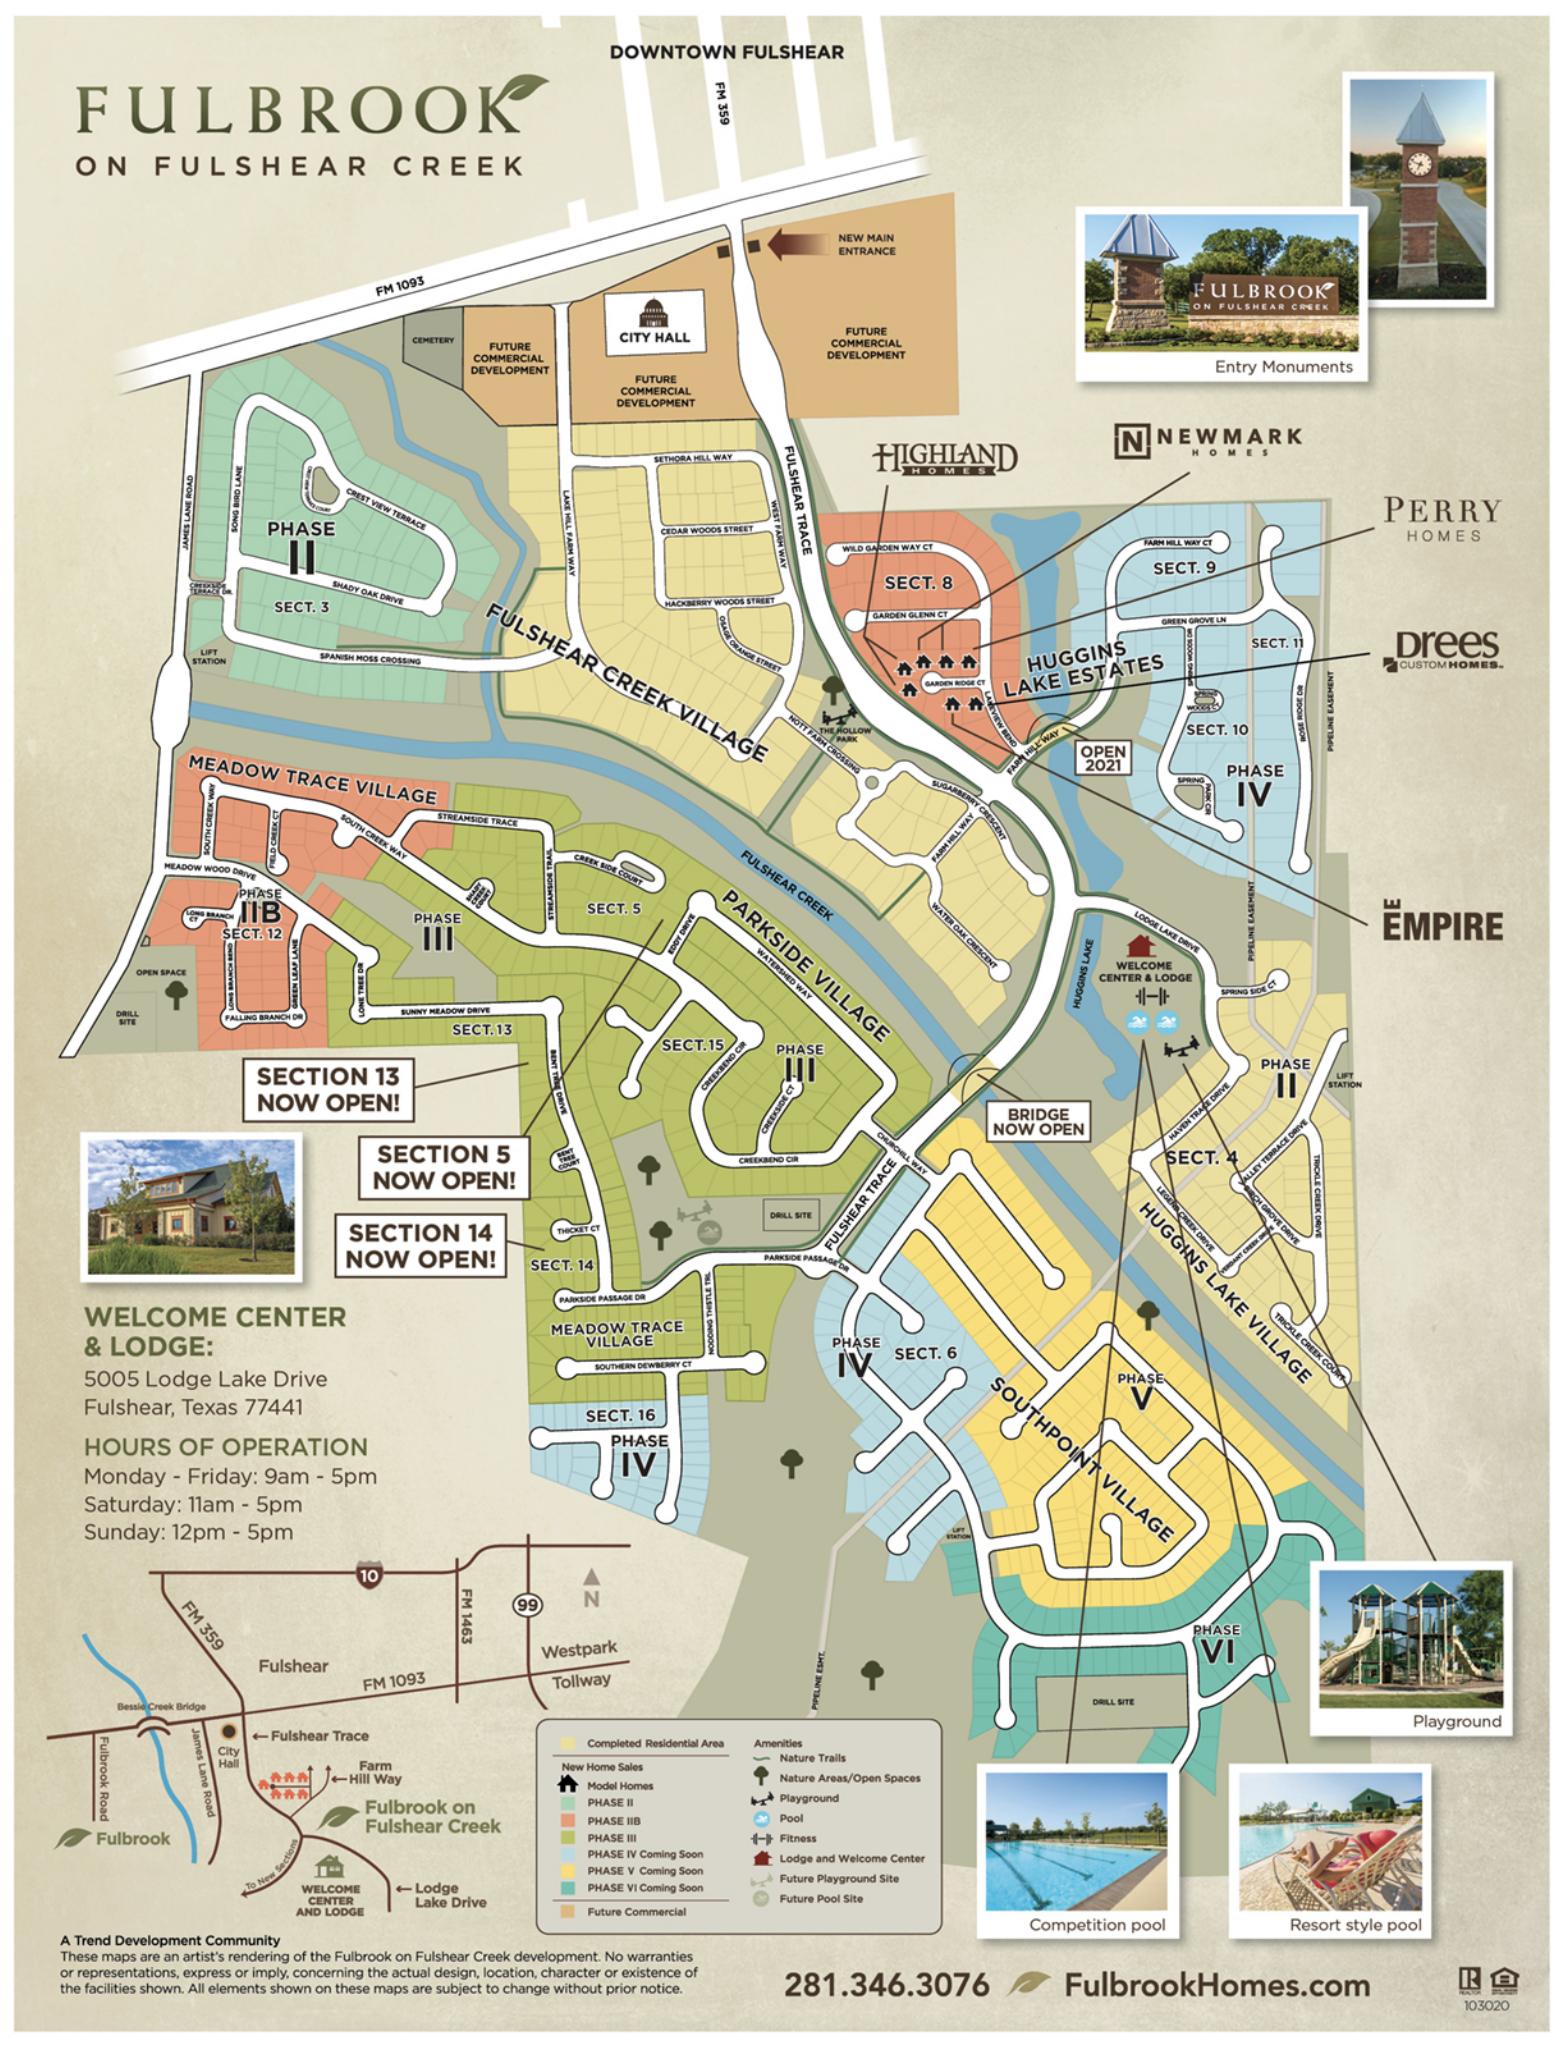 fulbrook_on_fulshear_creek_map